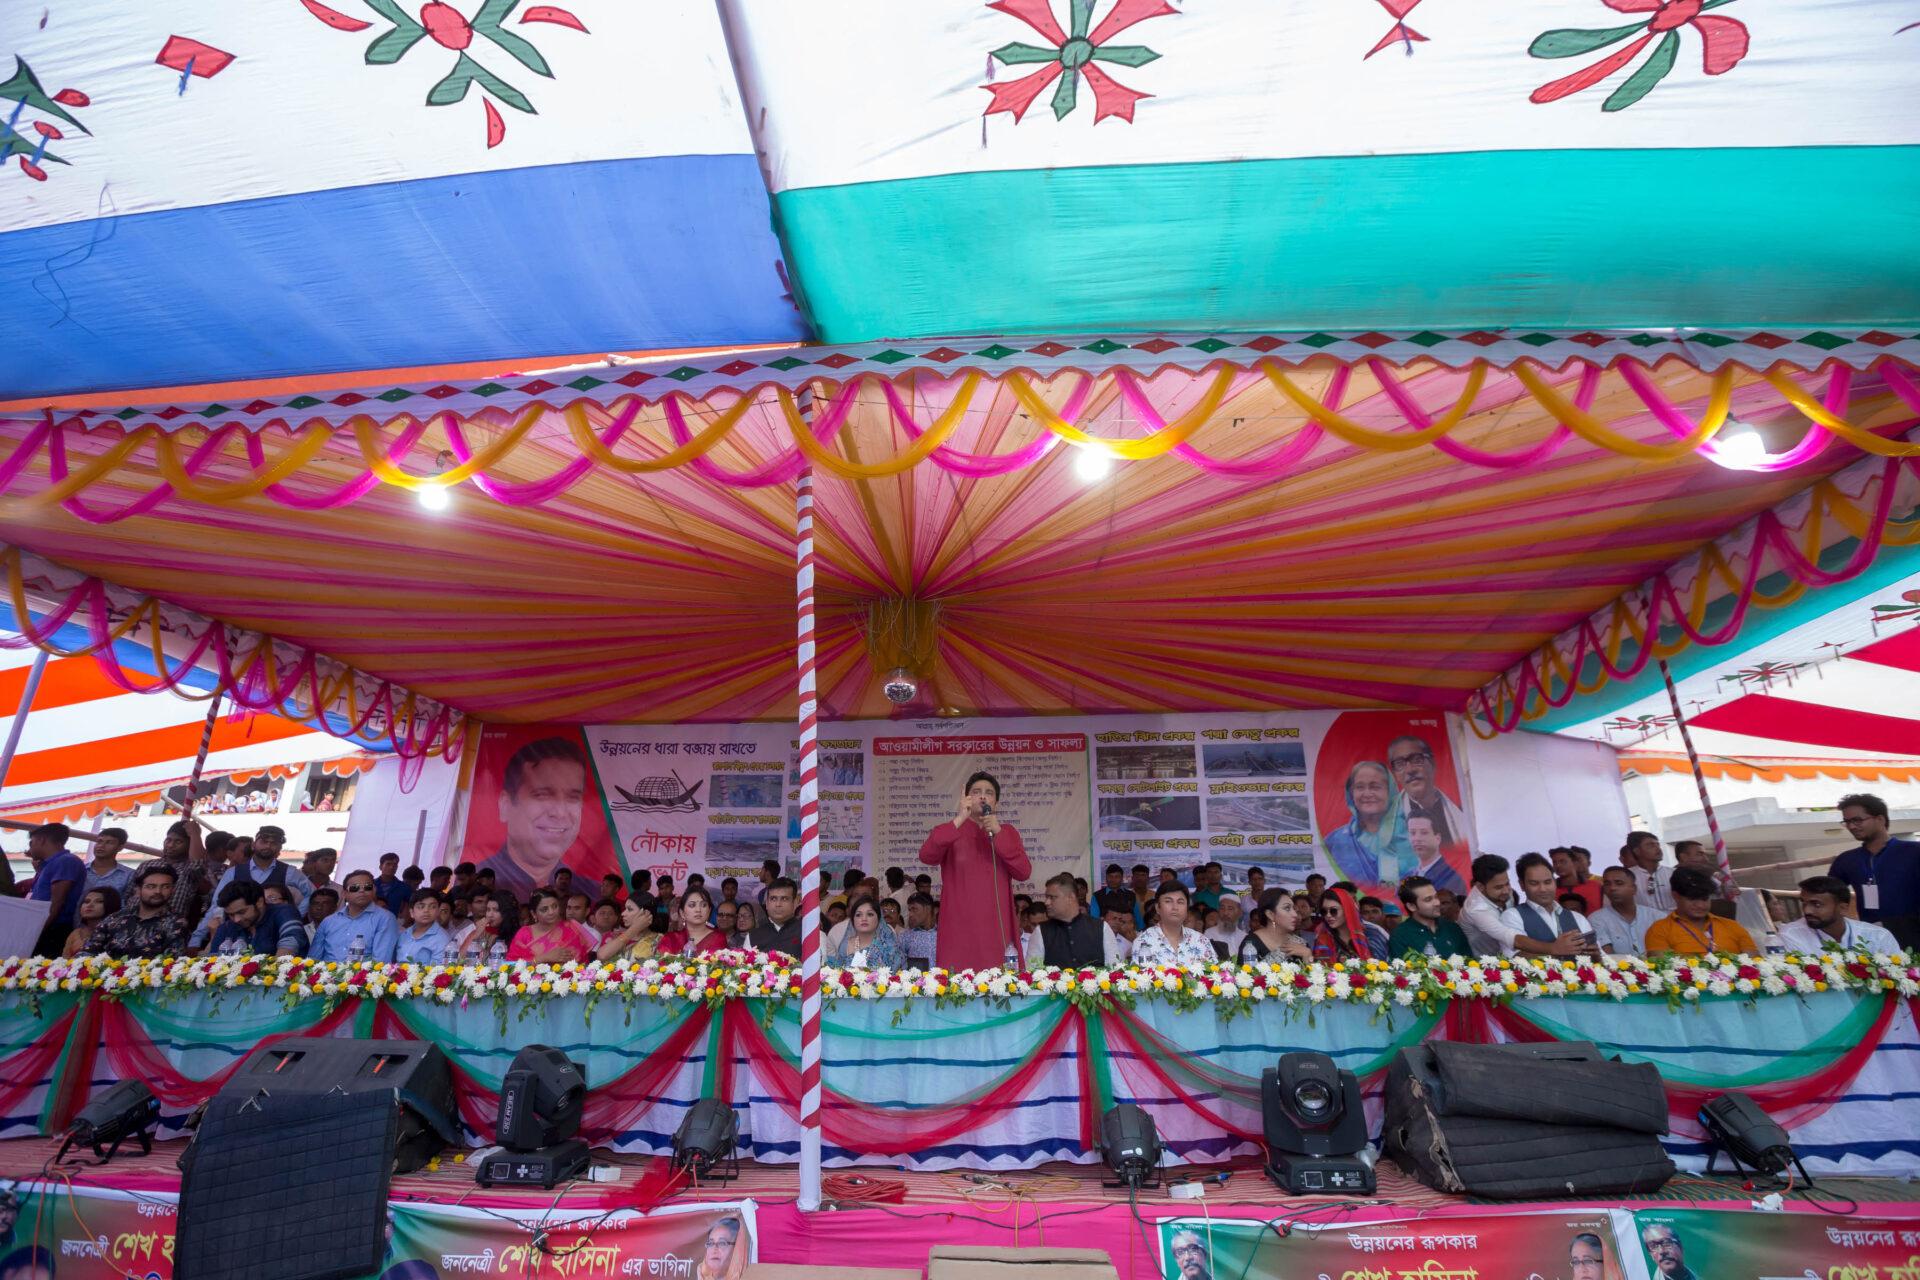 "YBCF Trip to Norshingdi Raipura 29.03 504 ""শেখ হাসিনার নেতৃত্বে আমাদের উন্নয়ন"" শীর্ষক দেশব্যাপী প্রচারণা"